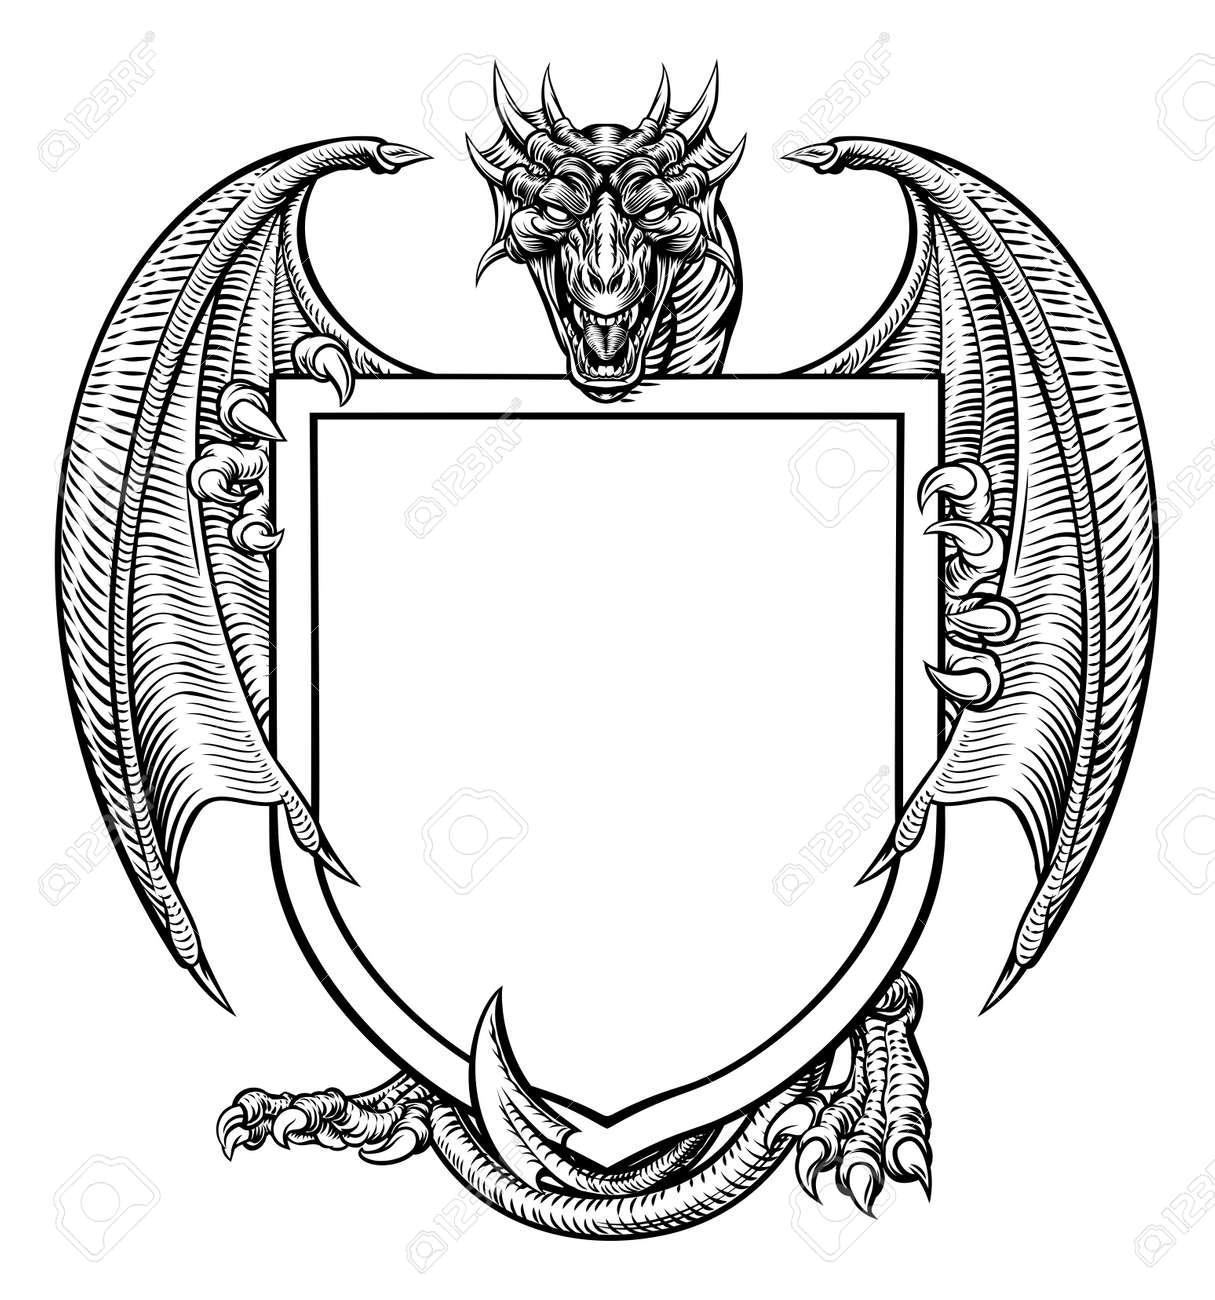 Dragon Crest Coat of Arms Shield Heraldic Emblem - 88536204